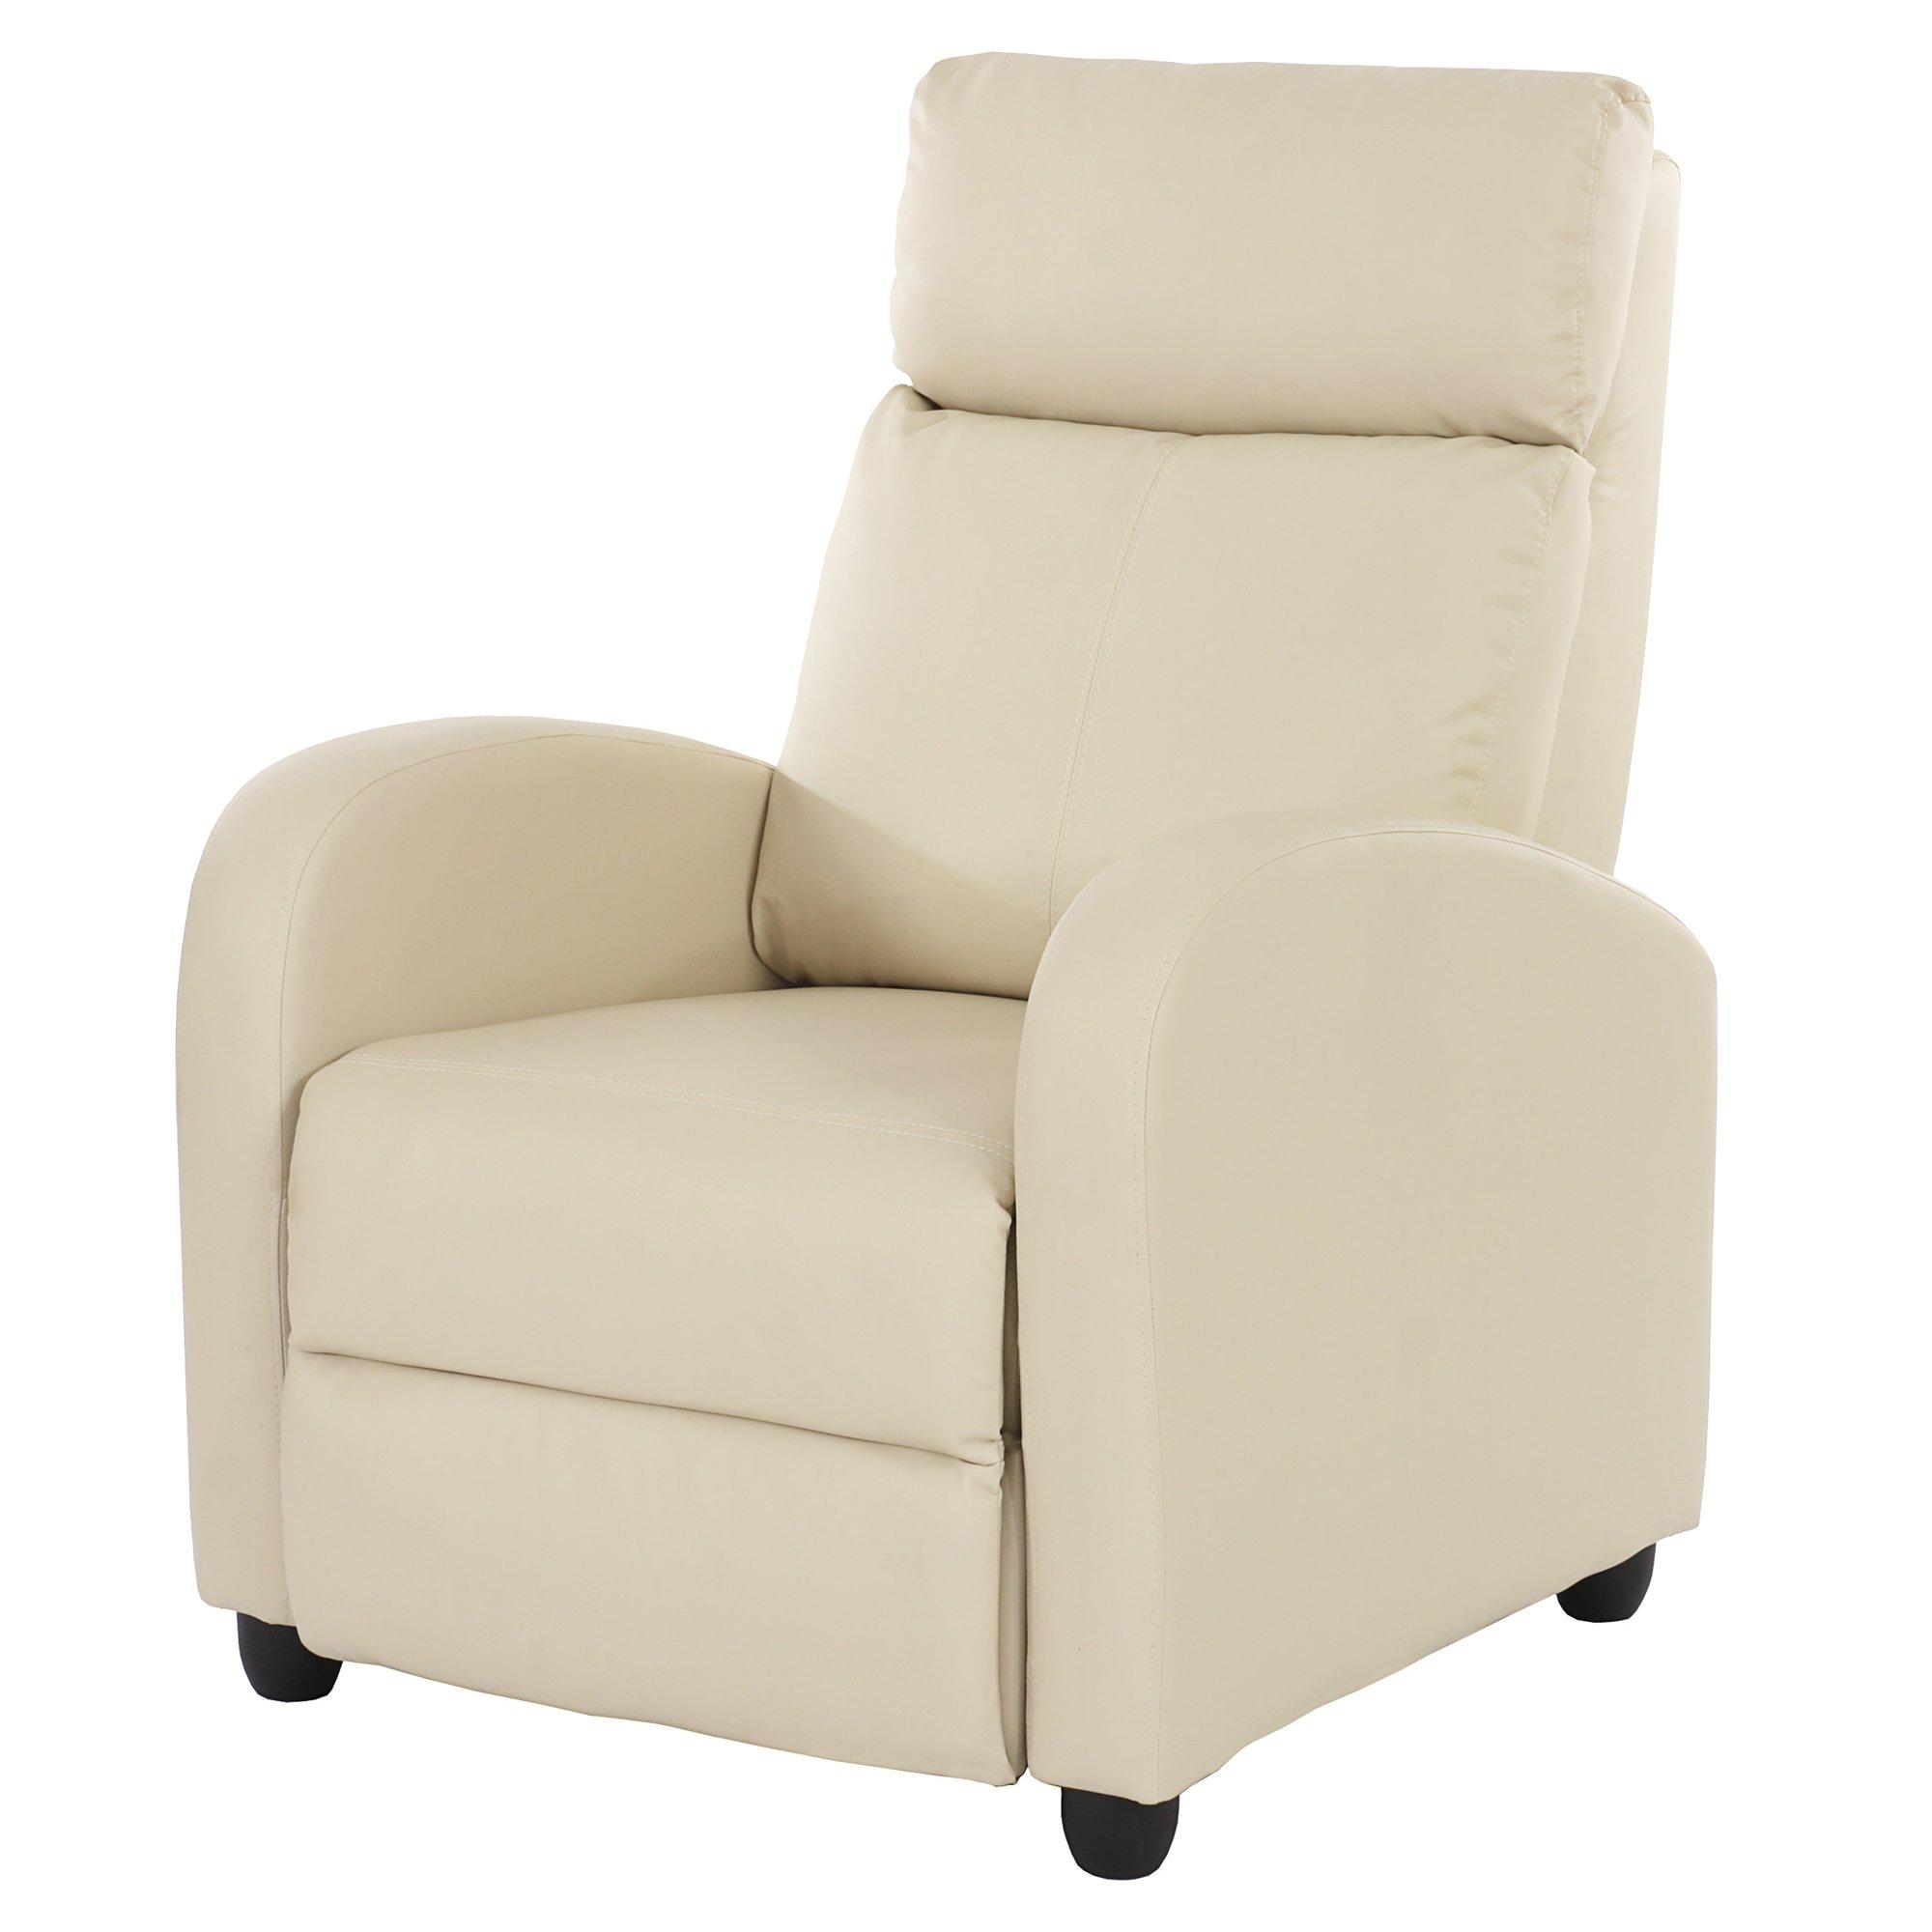 Precios de sillones reclinables 45022 silla ideas for Sillones reclinables precios